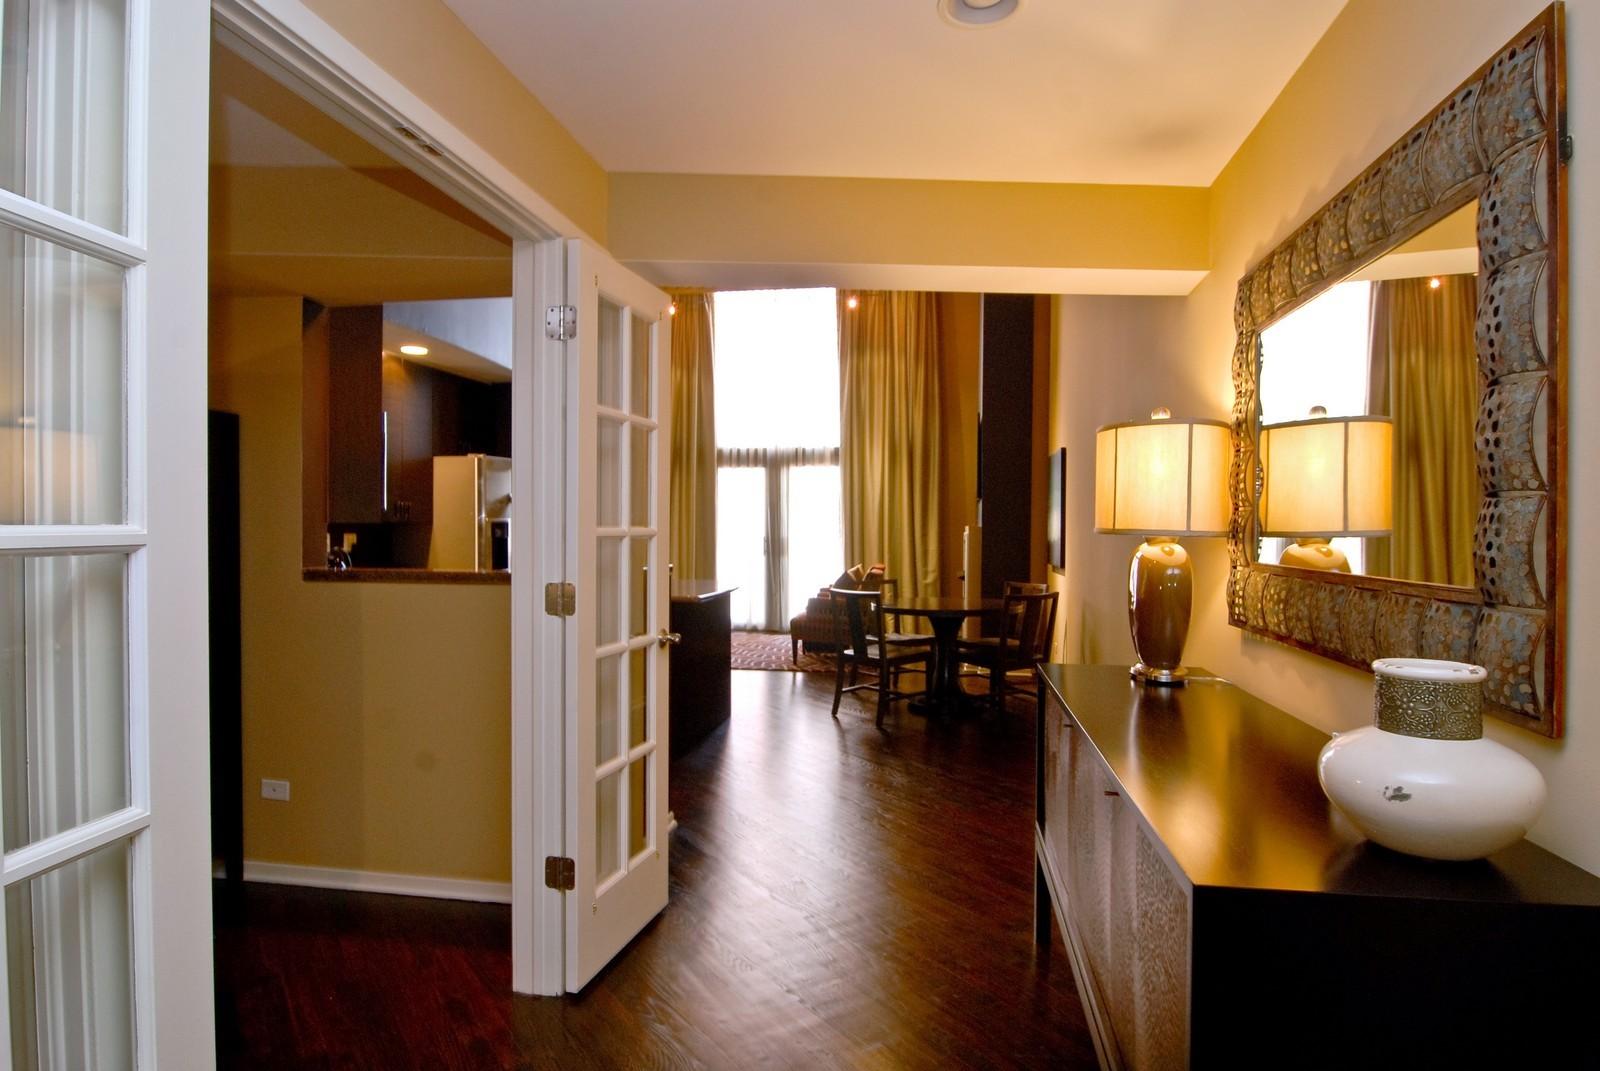 Real Estate Photography - 616 W Fulton, Unit 702, Chicago, IL, 60661 - Foyer